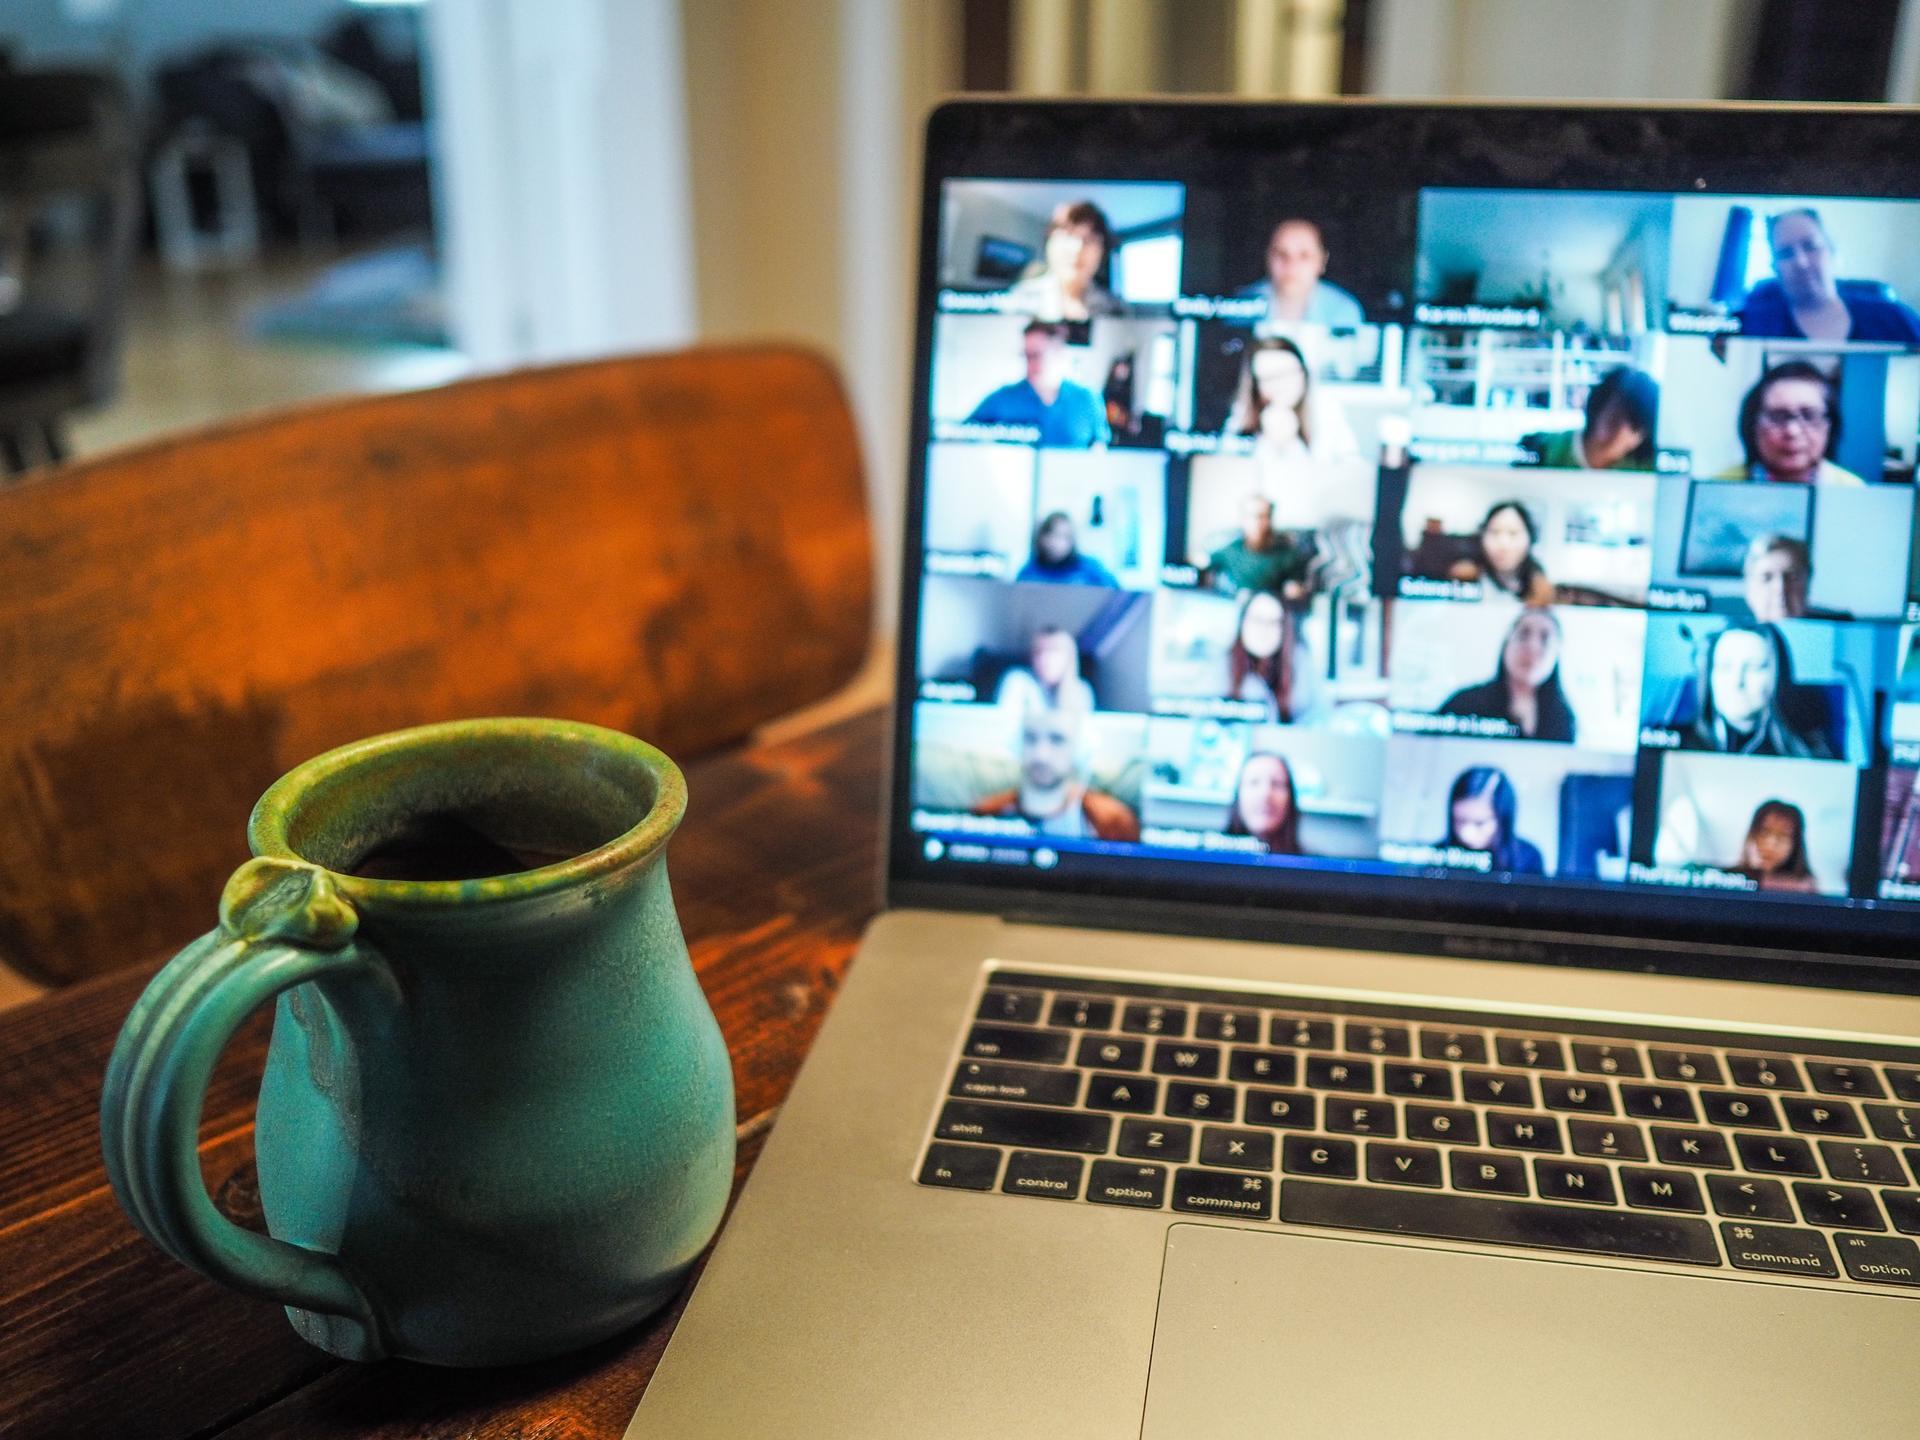 webcam zoom conference